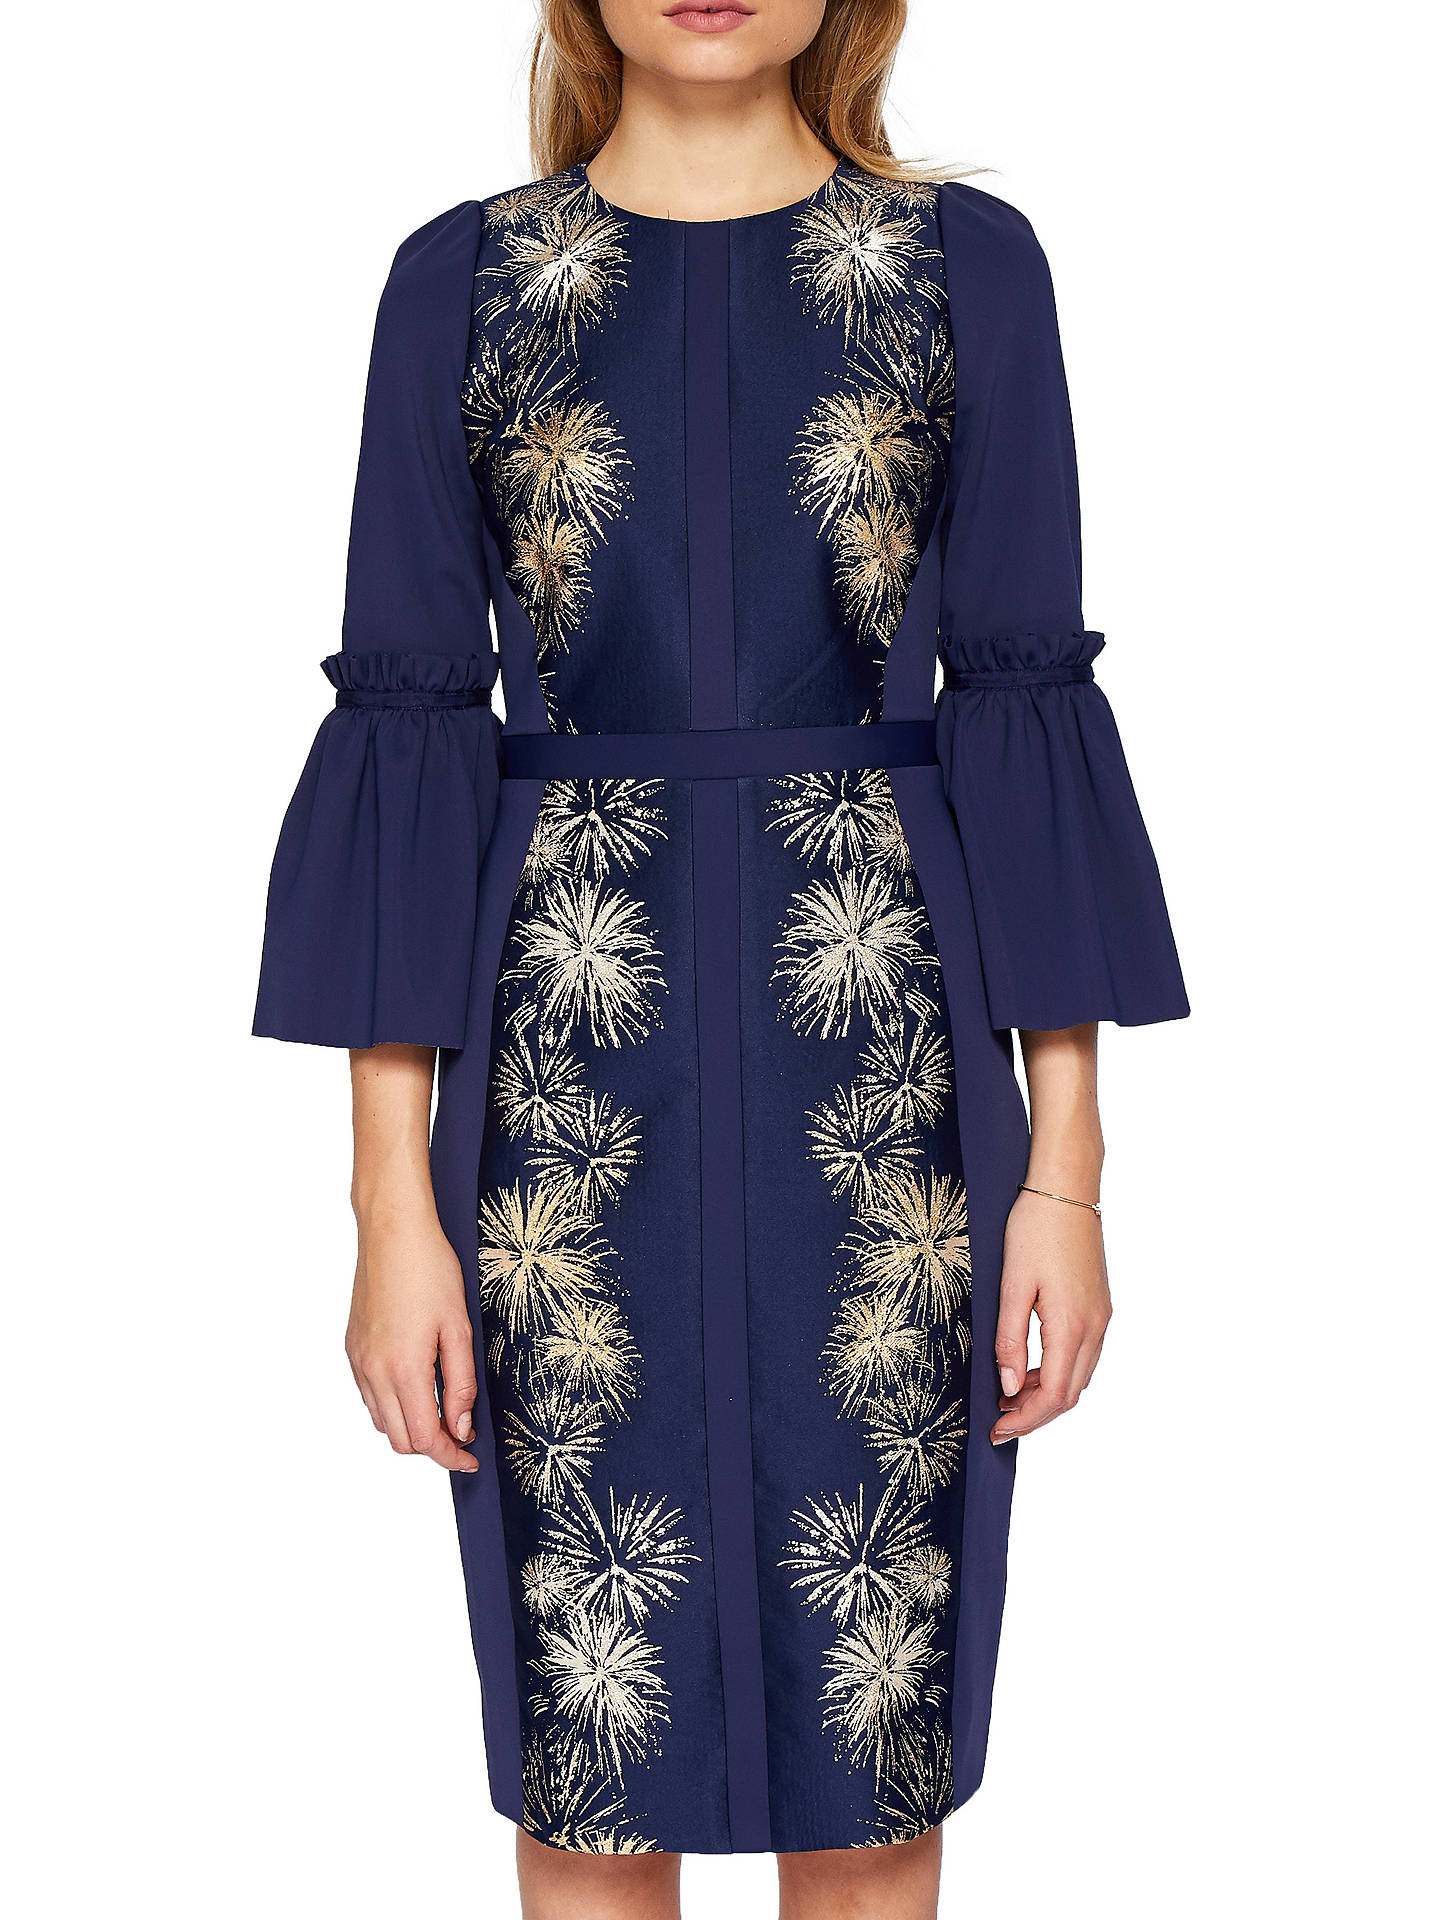 48c70c6a9 Buy Ted Baker Jeeane Stardust Flute Sleeve Dress